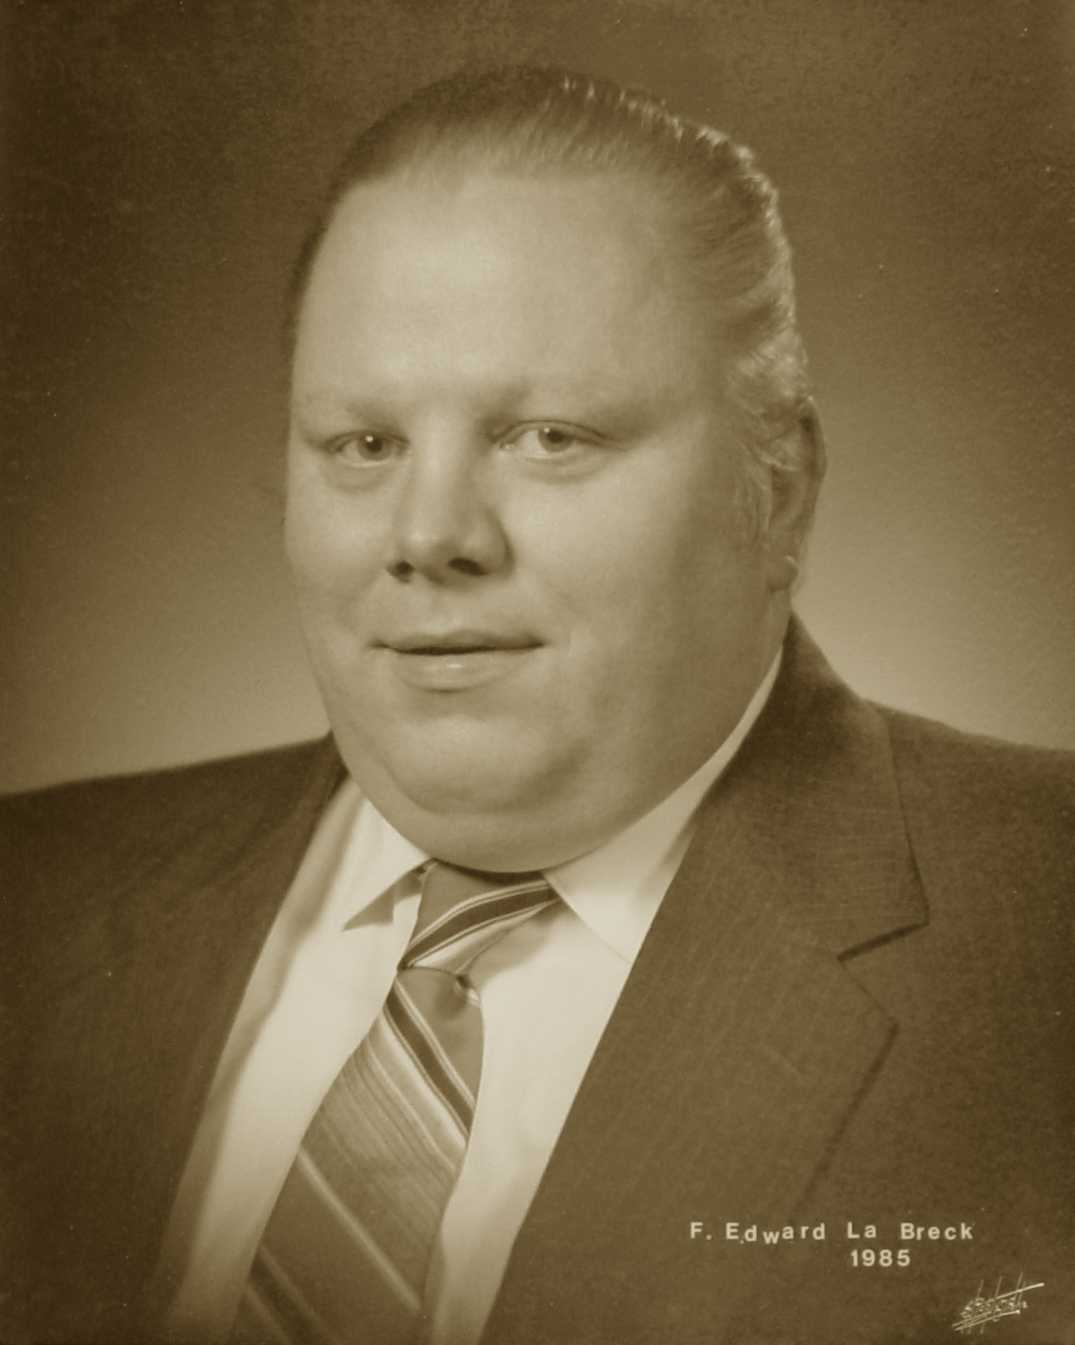 F. Edward LaBreck, 1985